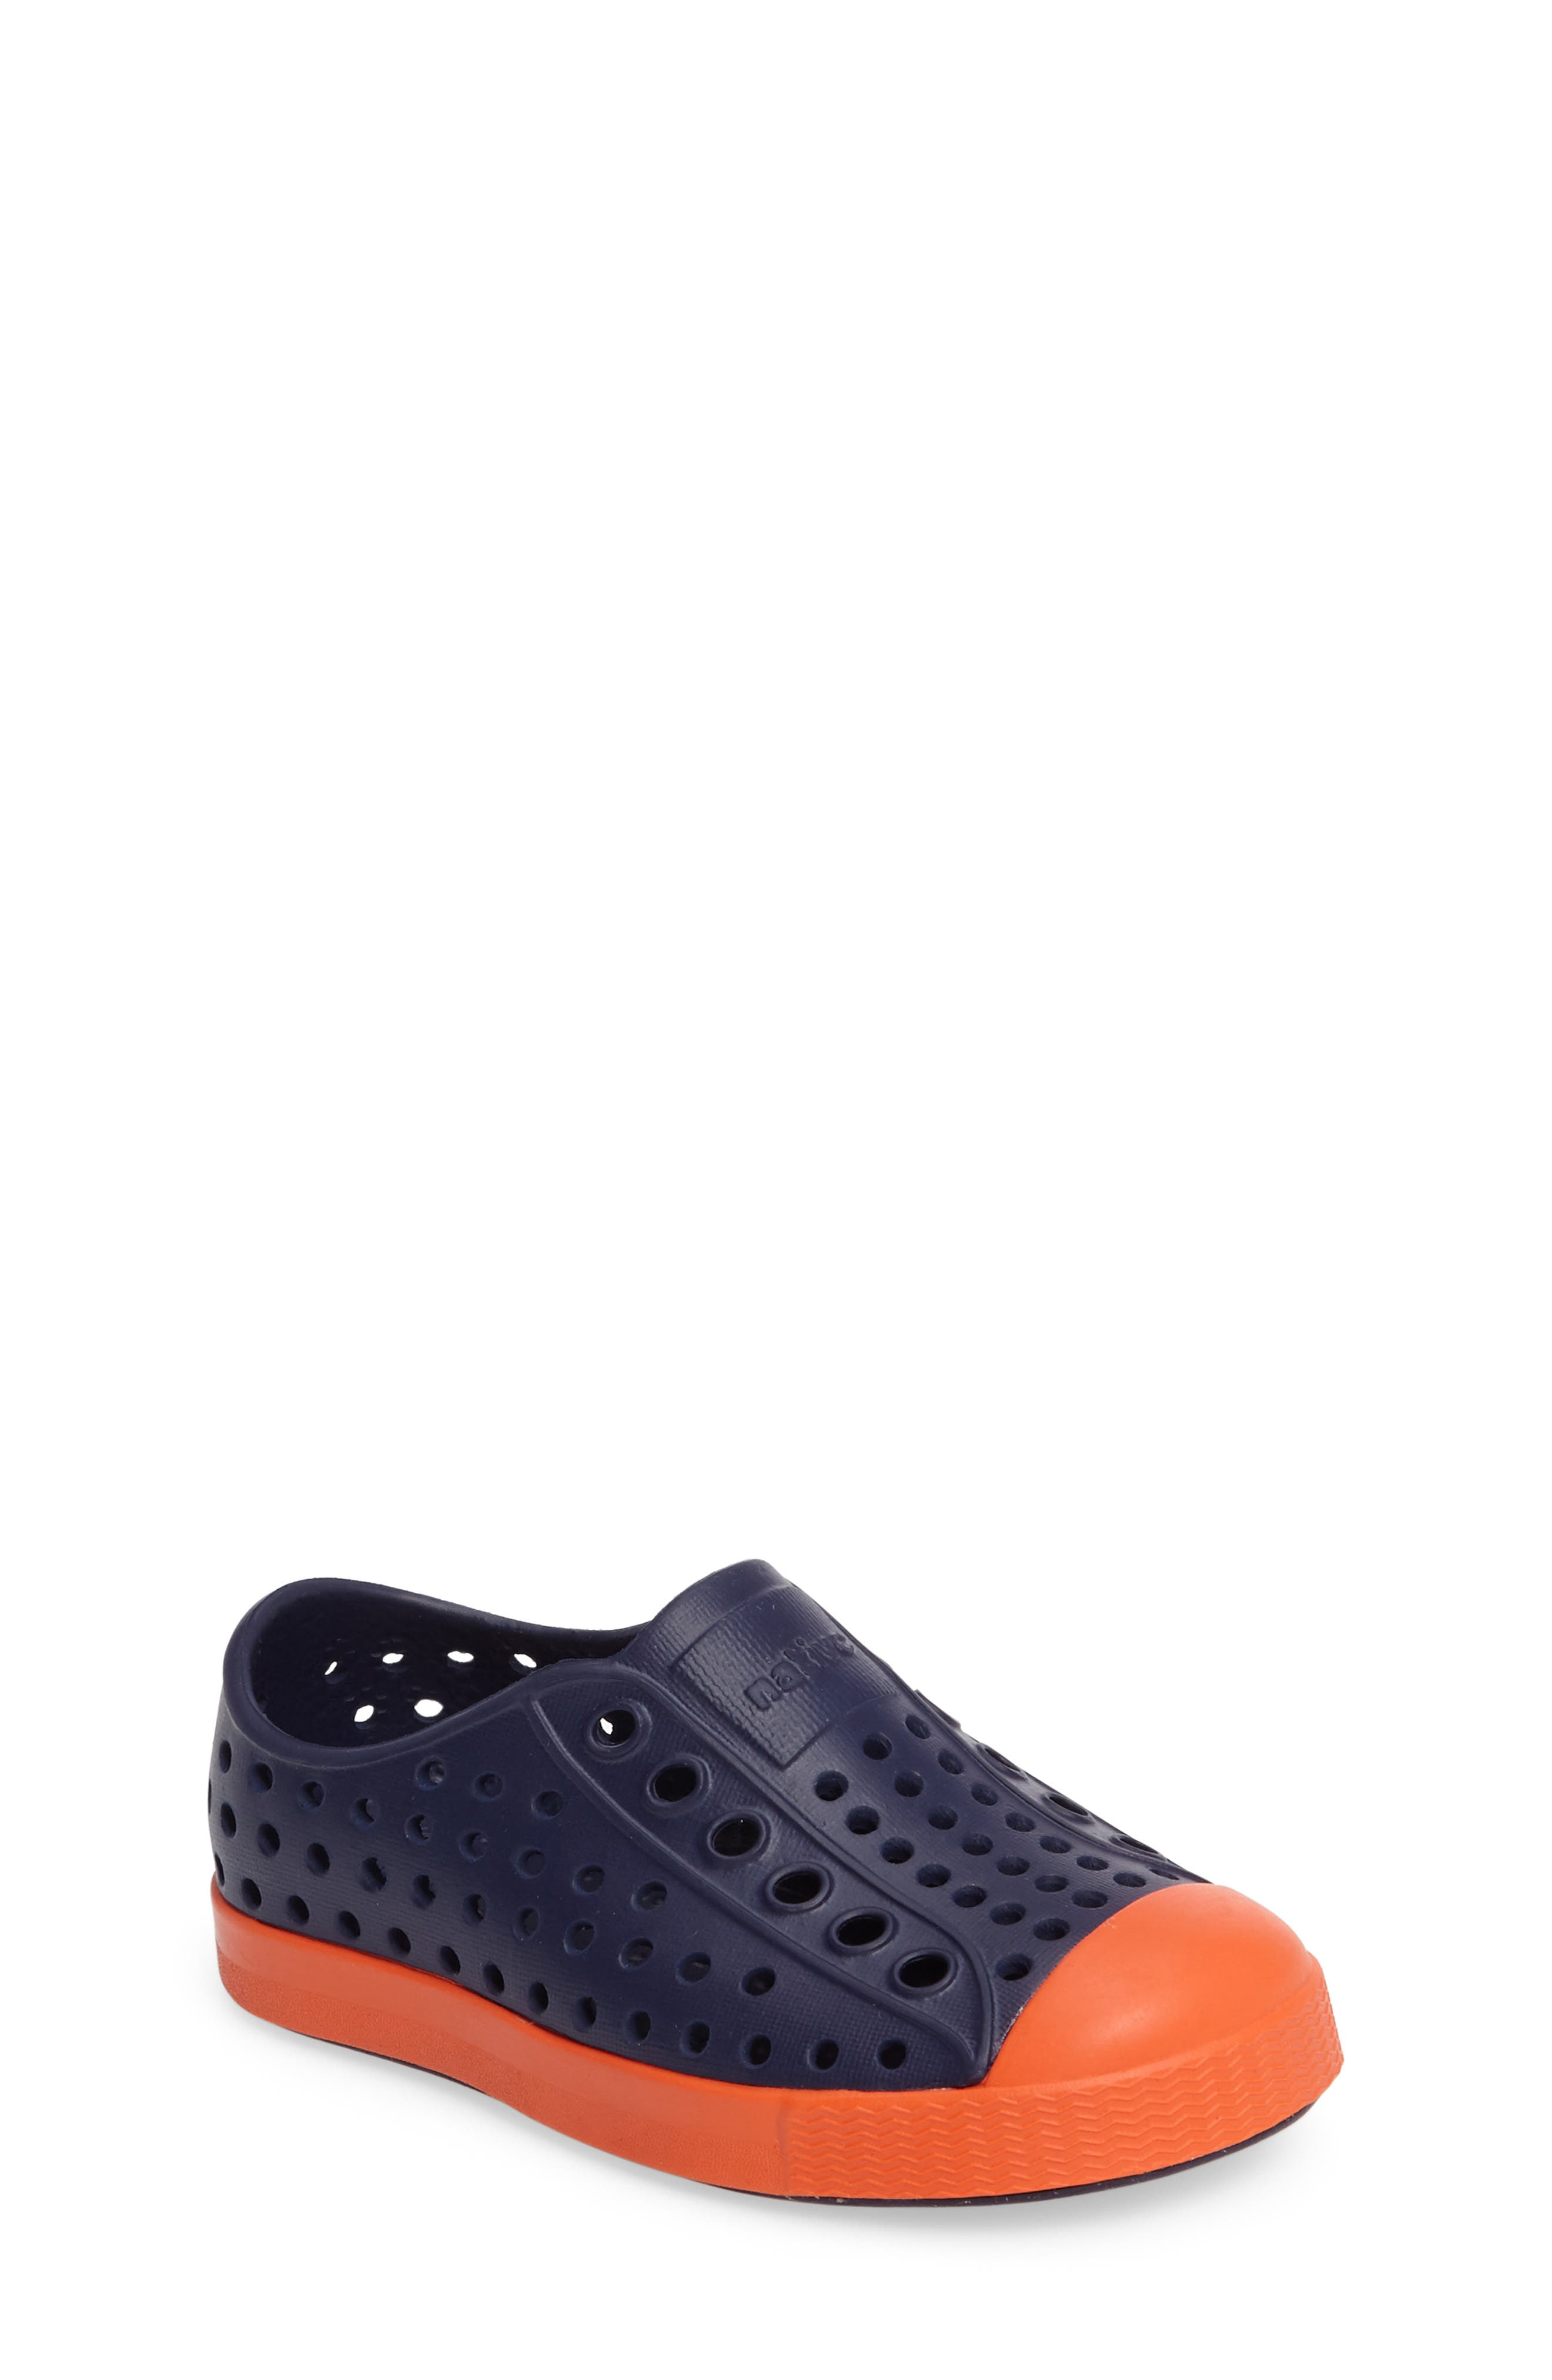 'Jefferson' Water Friendly Slip-On Sneaker,                             Main thumbnail 45, color,